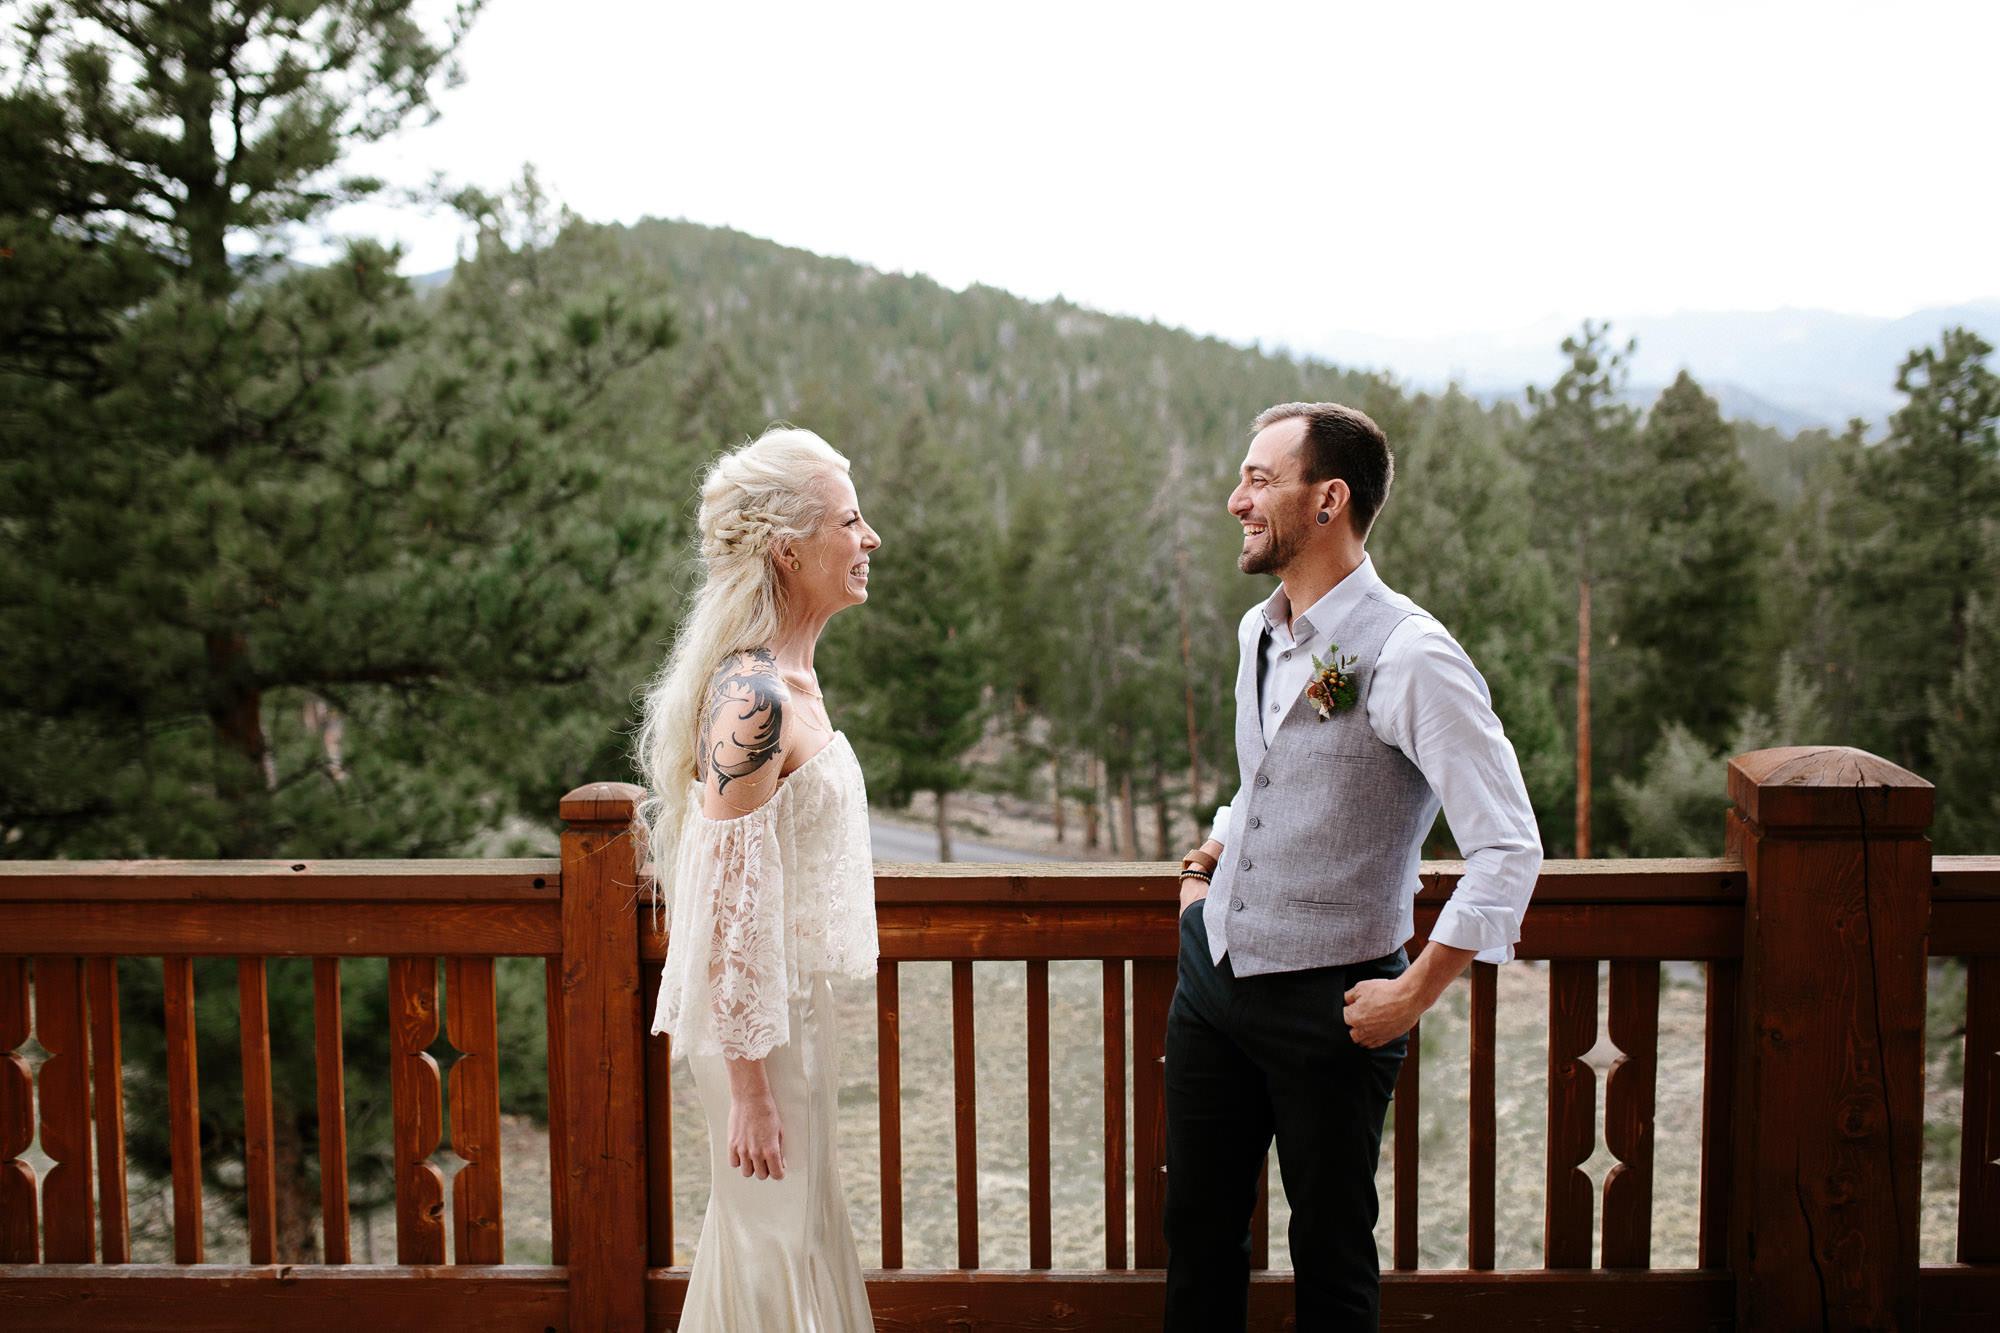 bucci-barn-wedding-elopement-evergreen-boulder-denver-colorado-adventerous-romantic-timeless-034.jpg